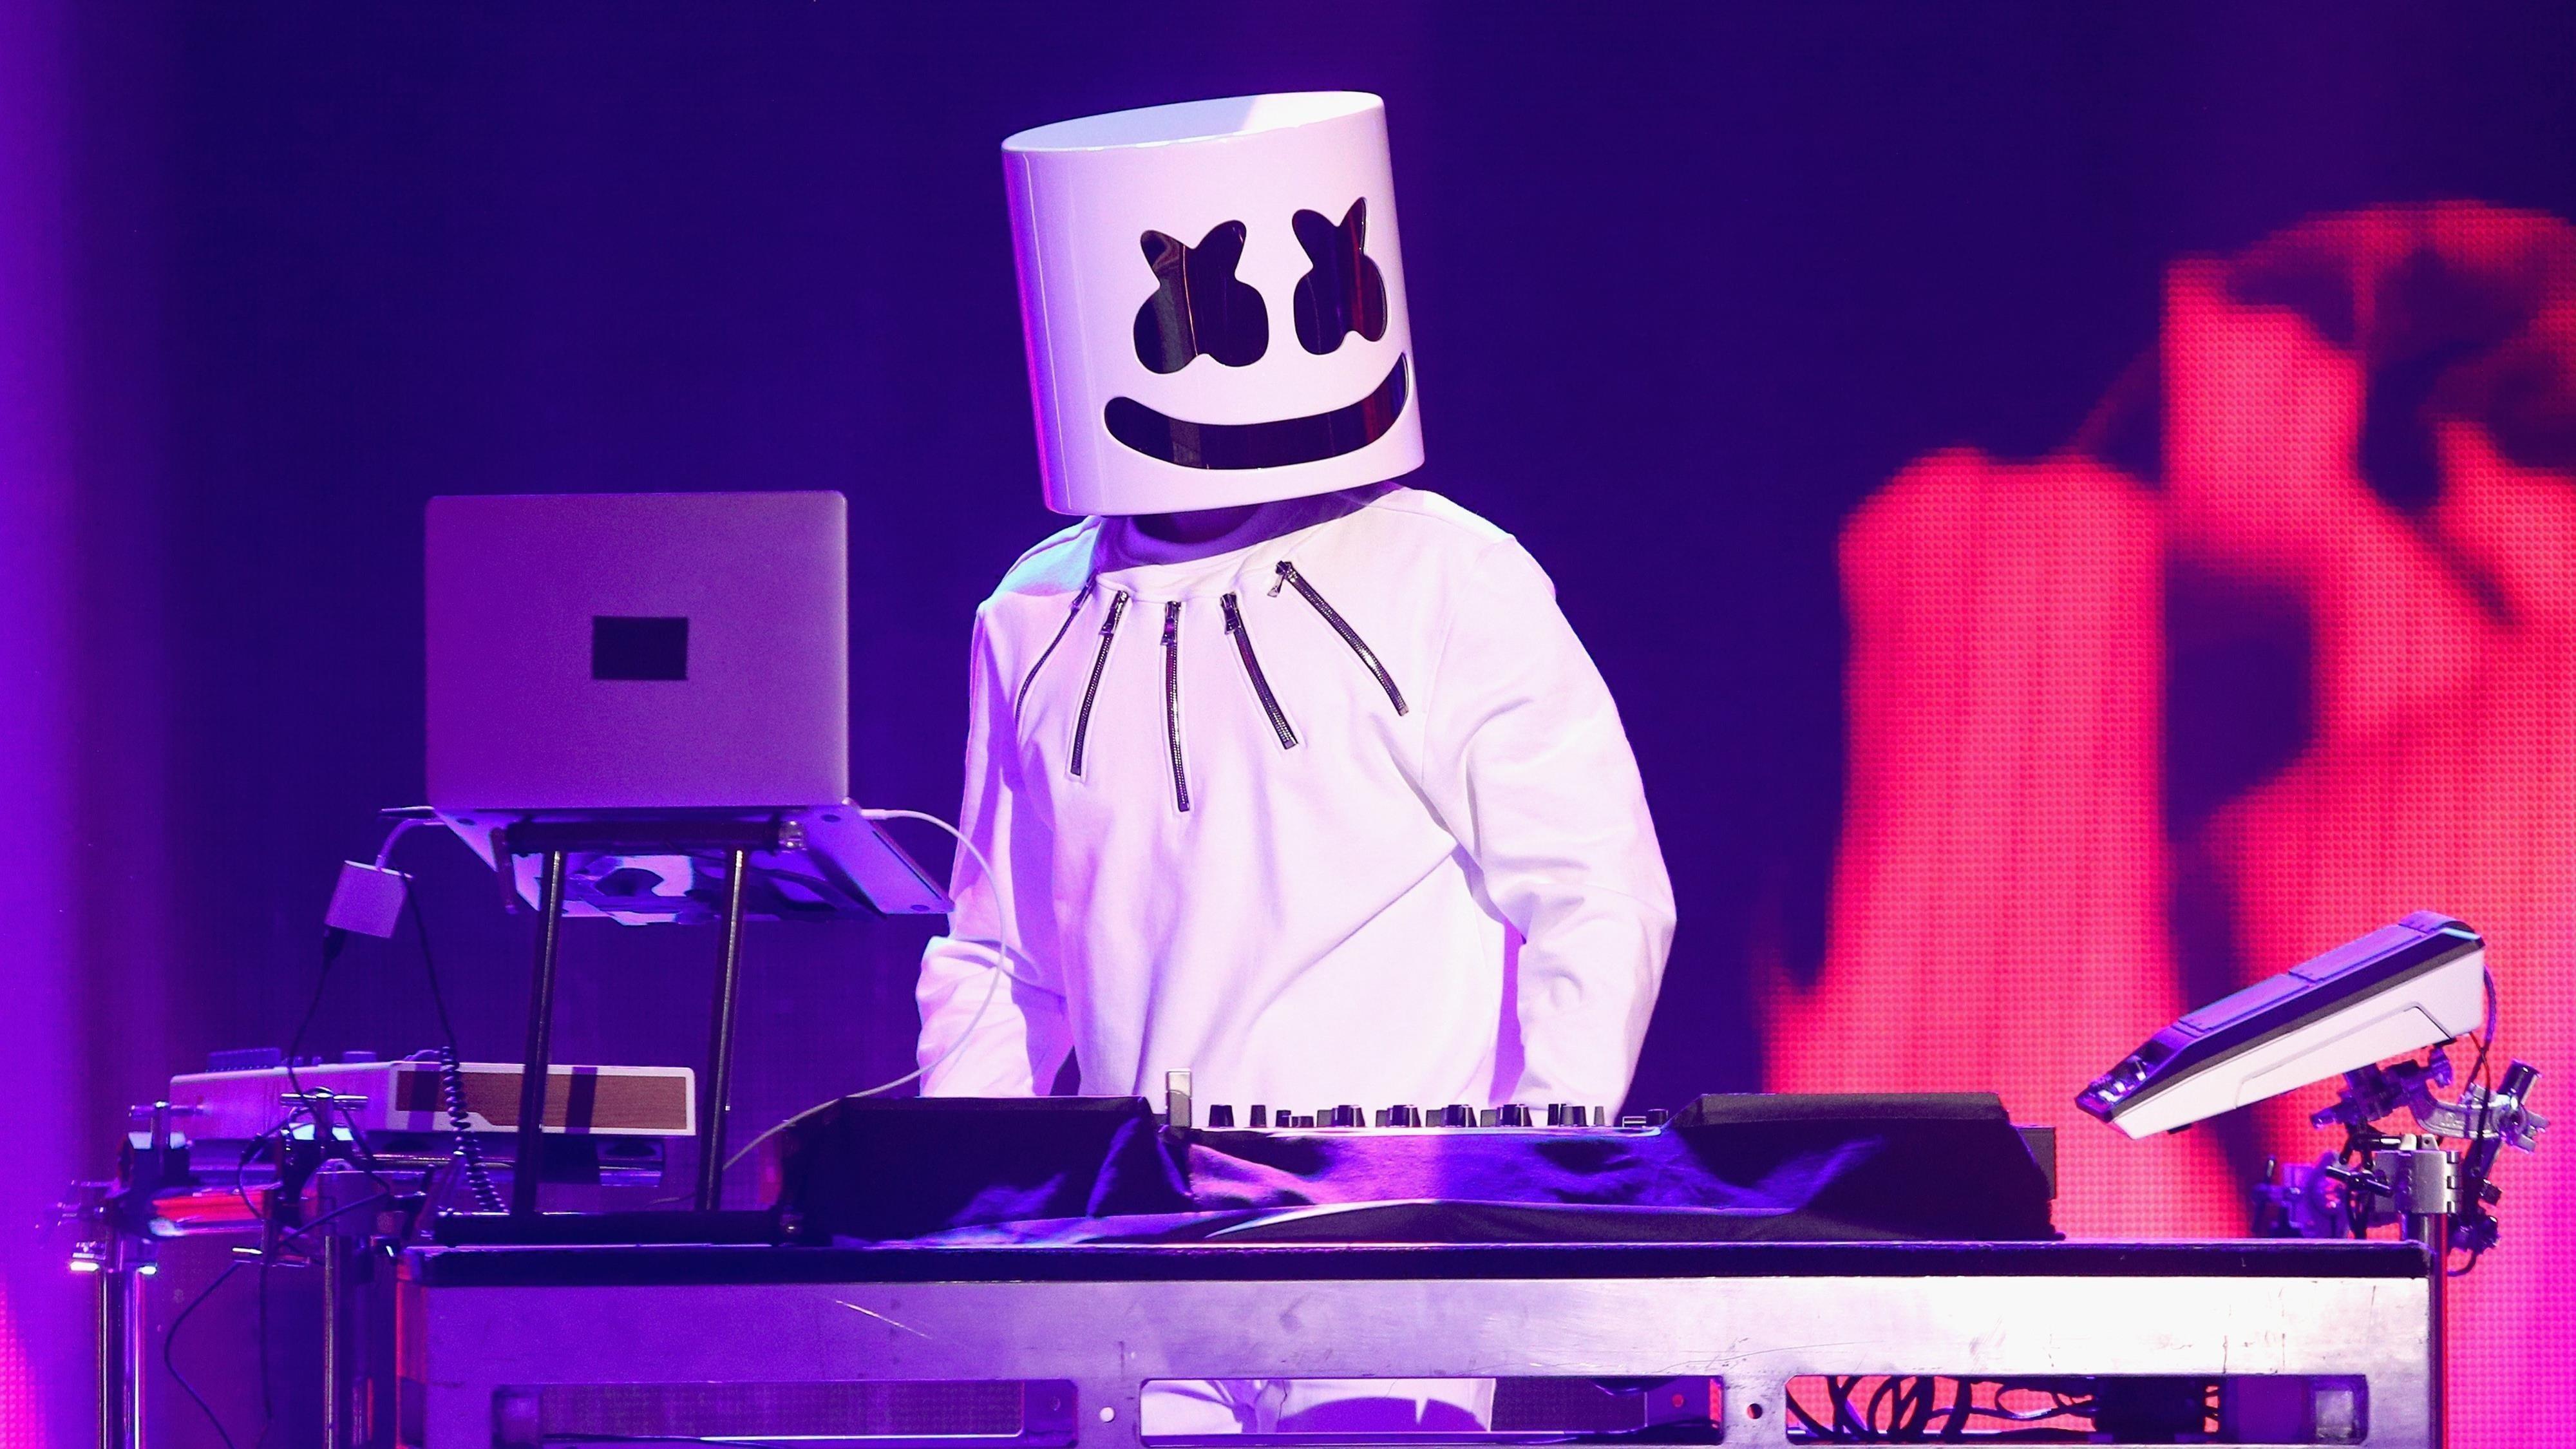 Marshmello american dj live концерт обои скачать